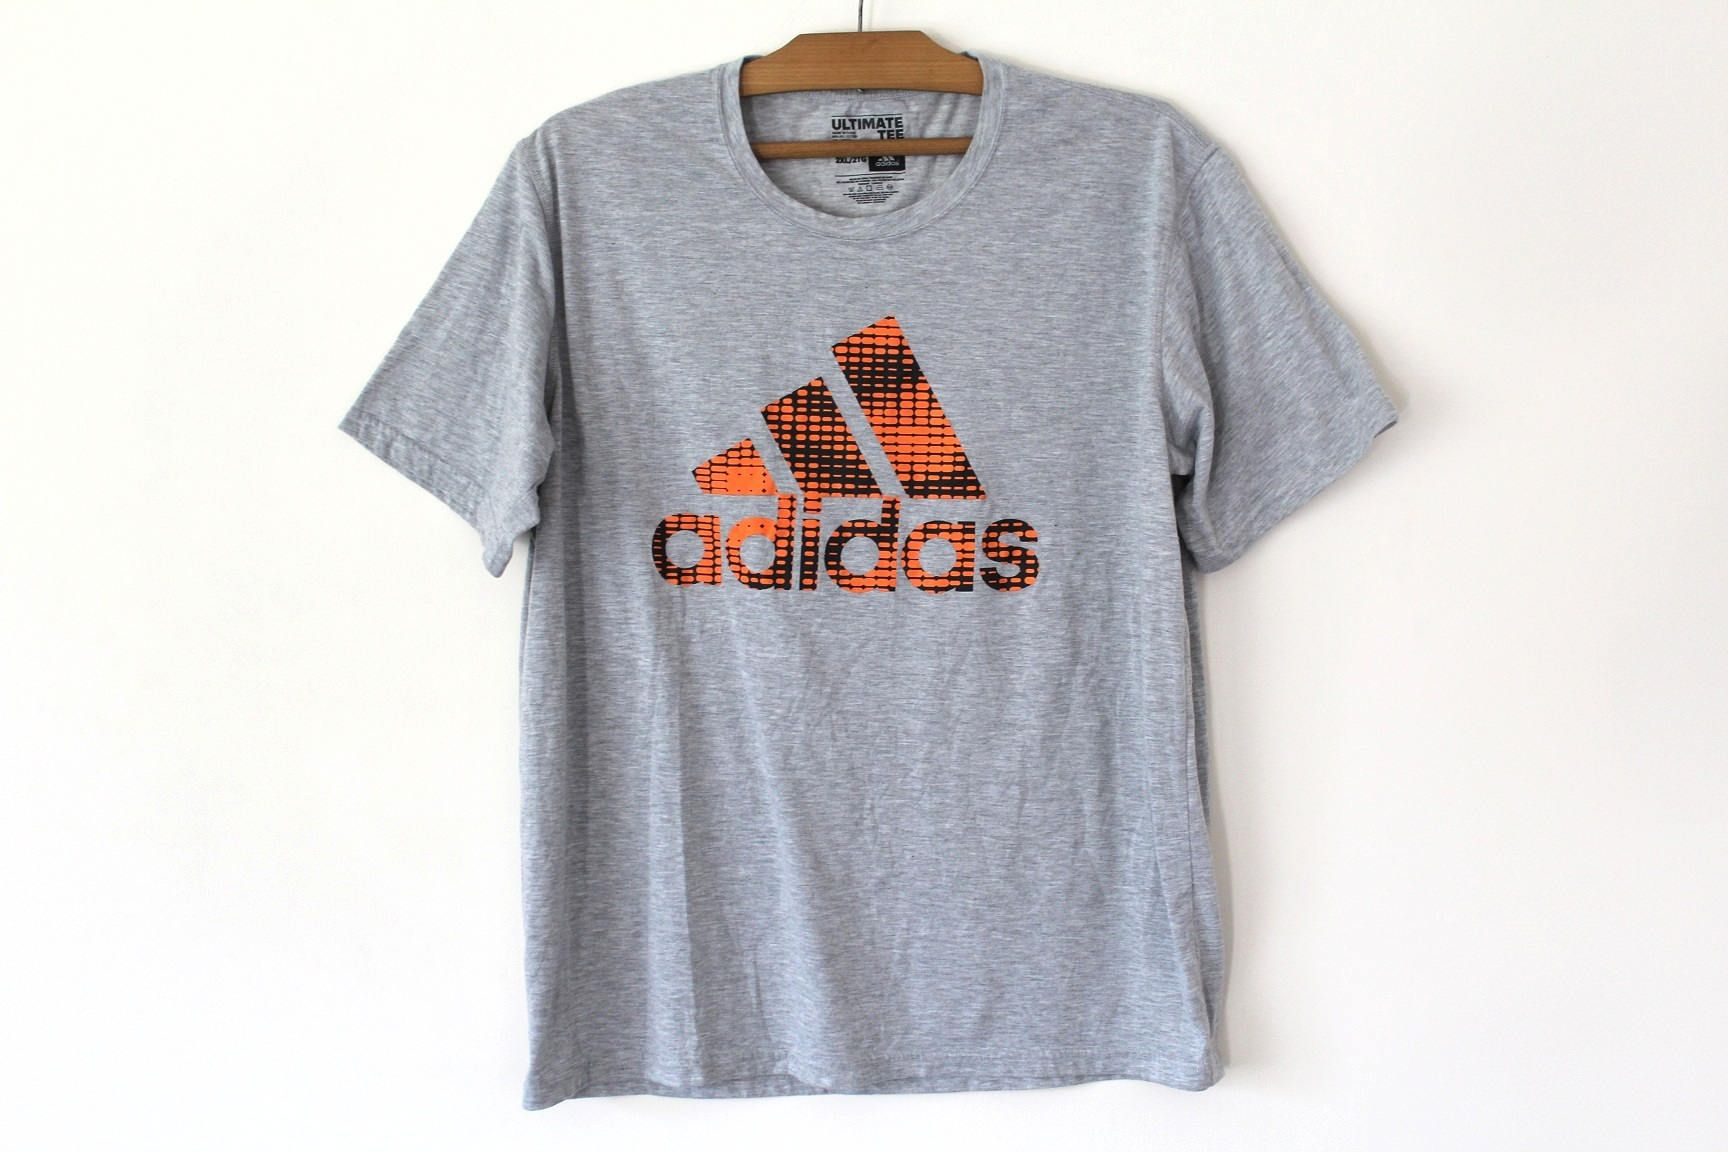 This Item Is Unavailable Etsy Adidas Sweatshirt Vintage Adidas Sweatshirts [ 1152 x 1728 Pixel ]